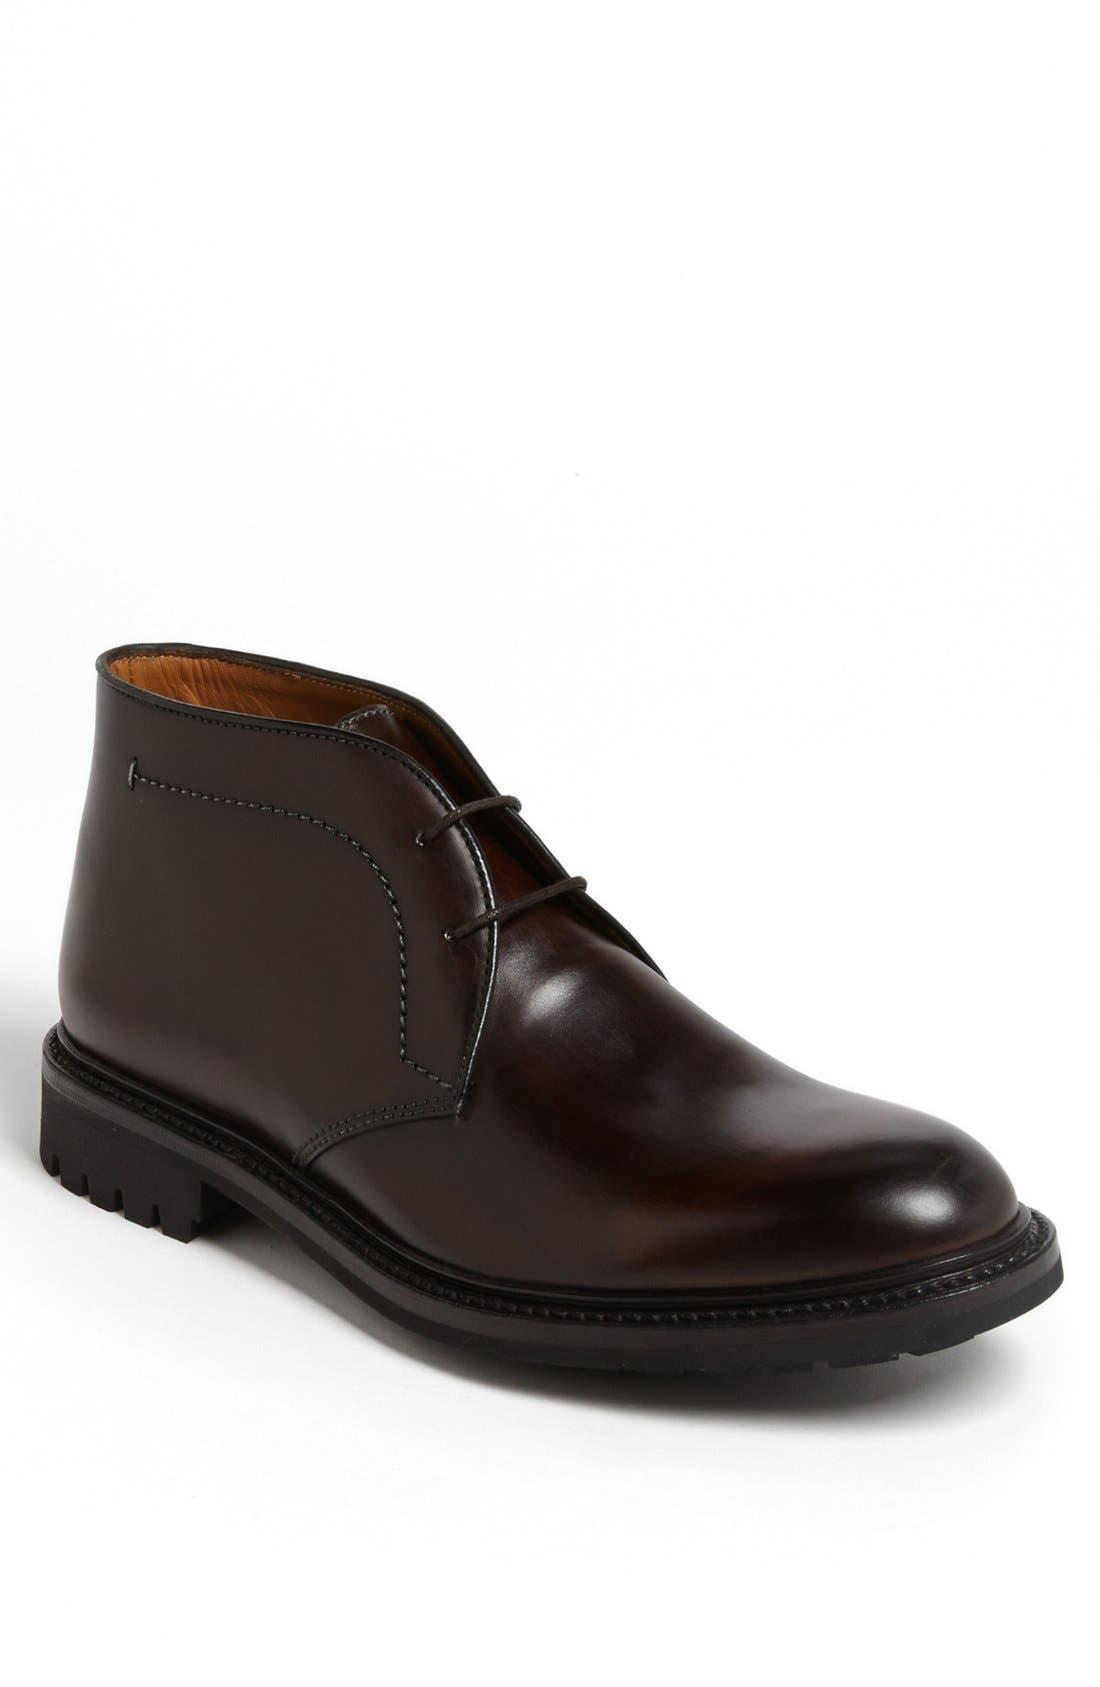 Main Image - Lottusse Leather Chukka Boot